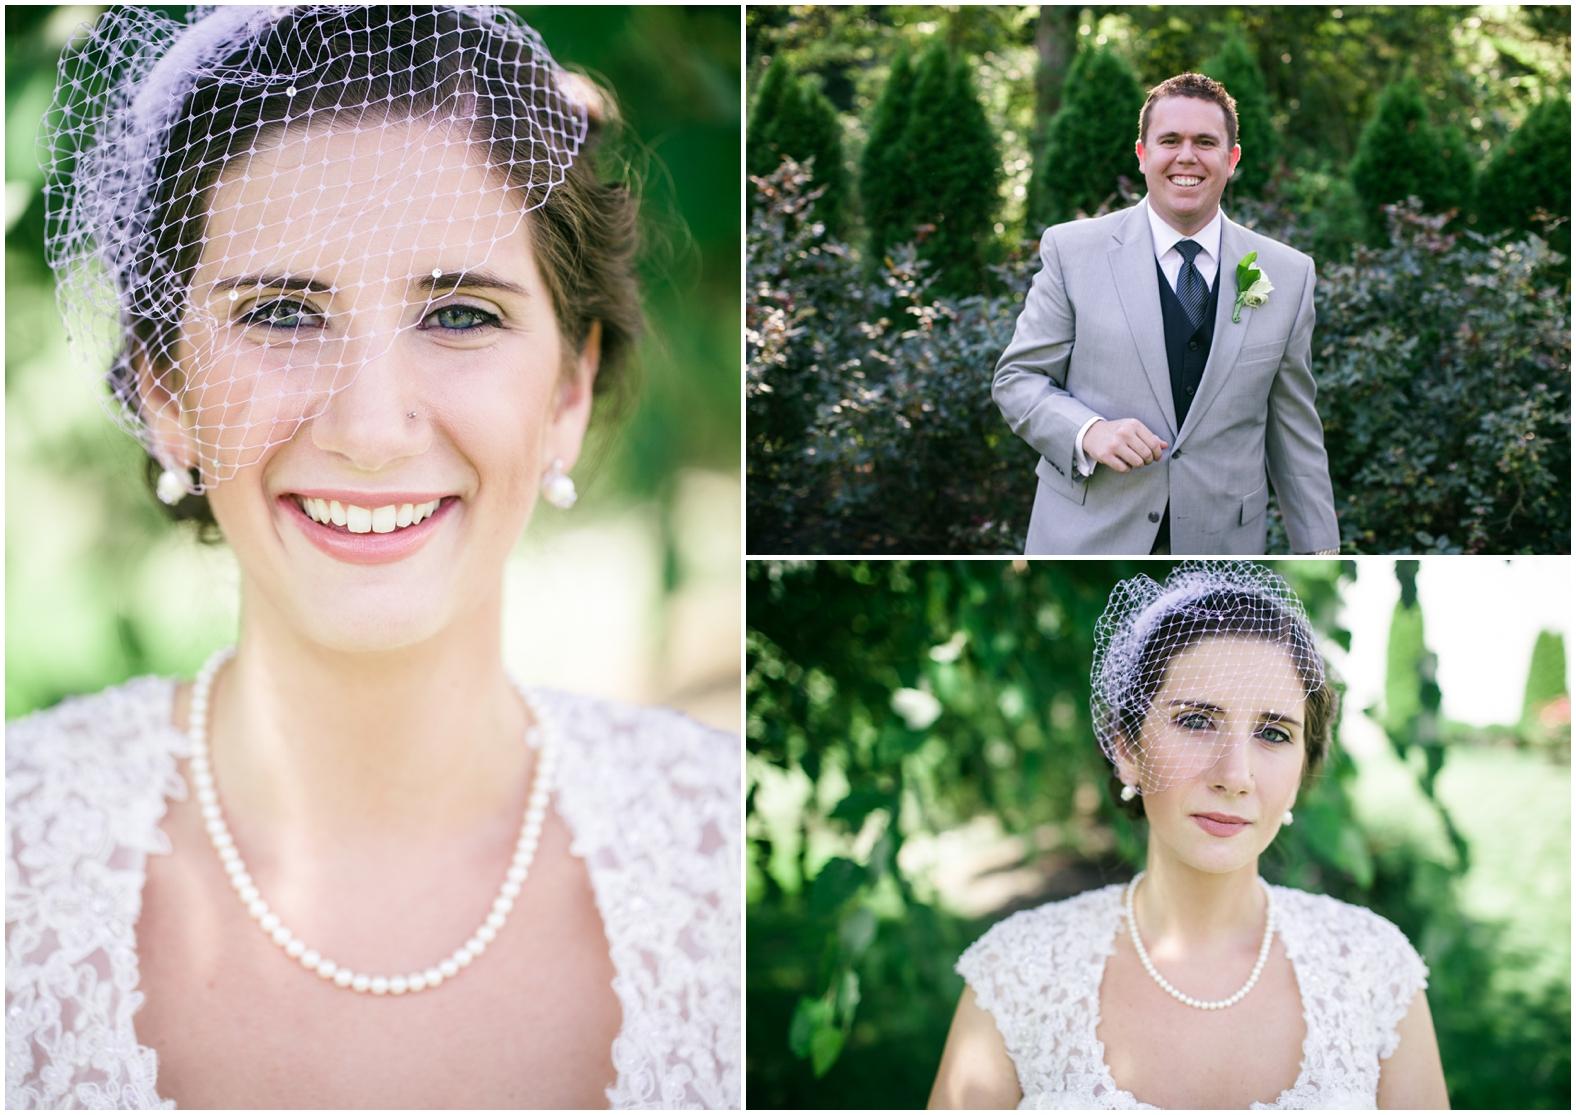 Suzy Ryan Married at the William Penn Inn